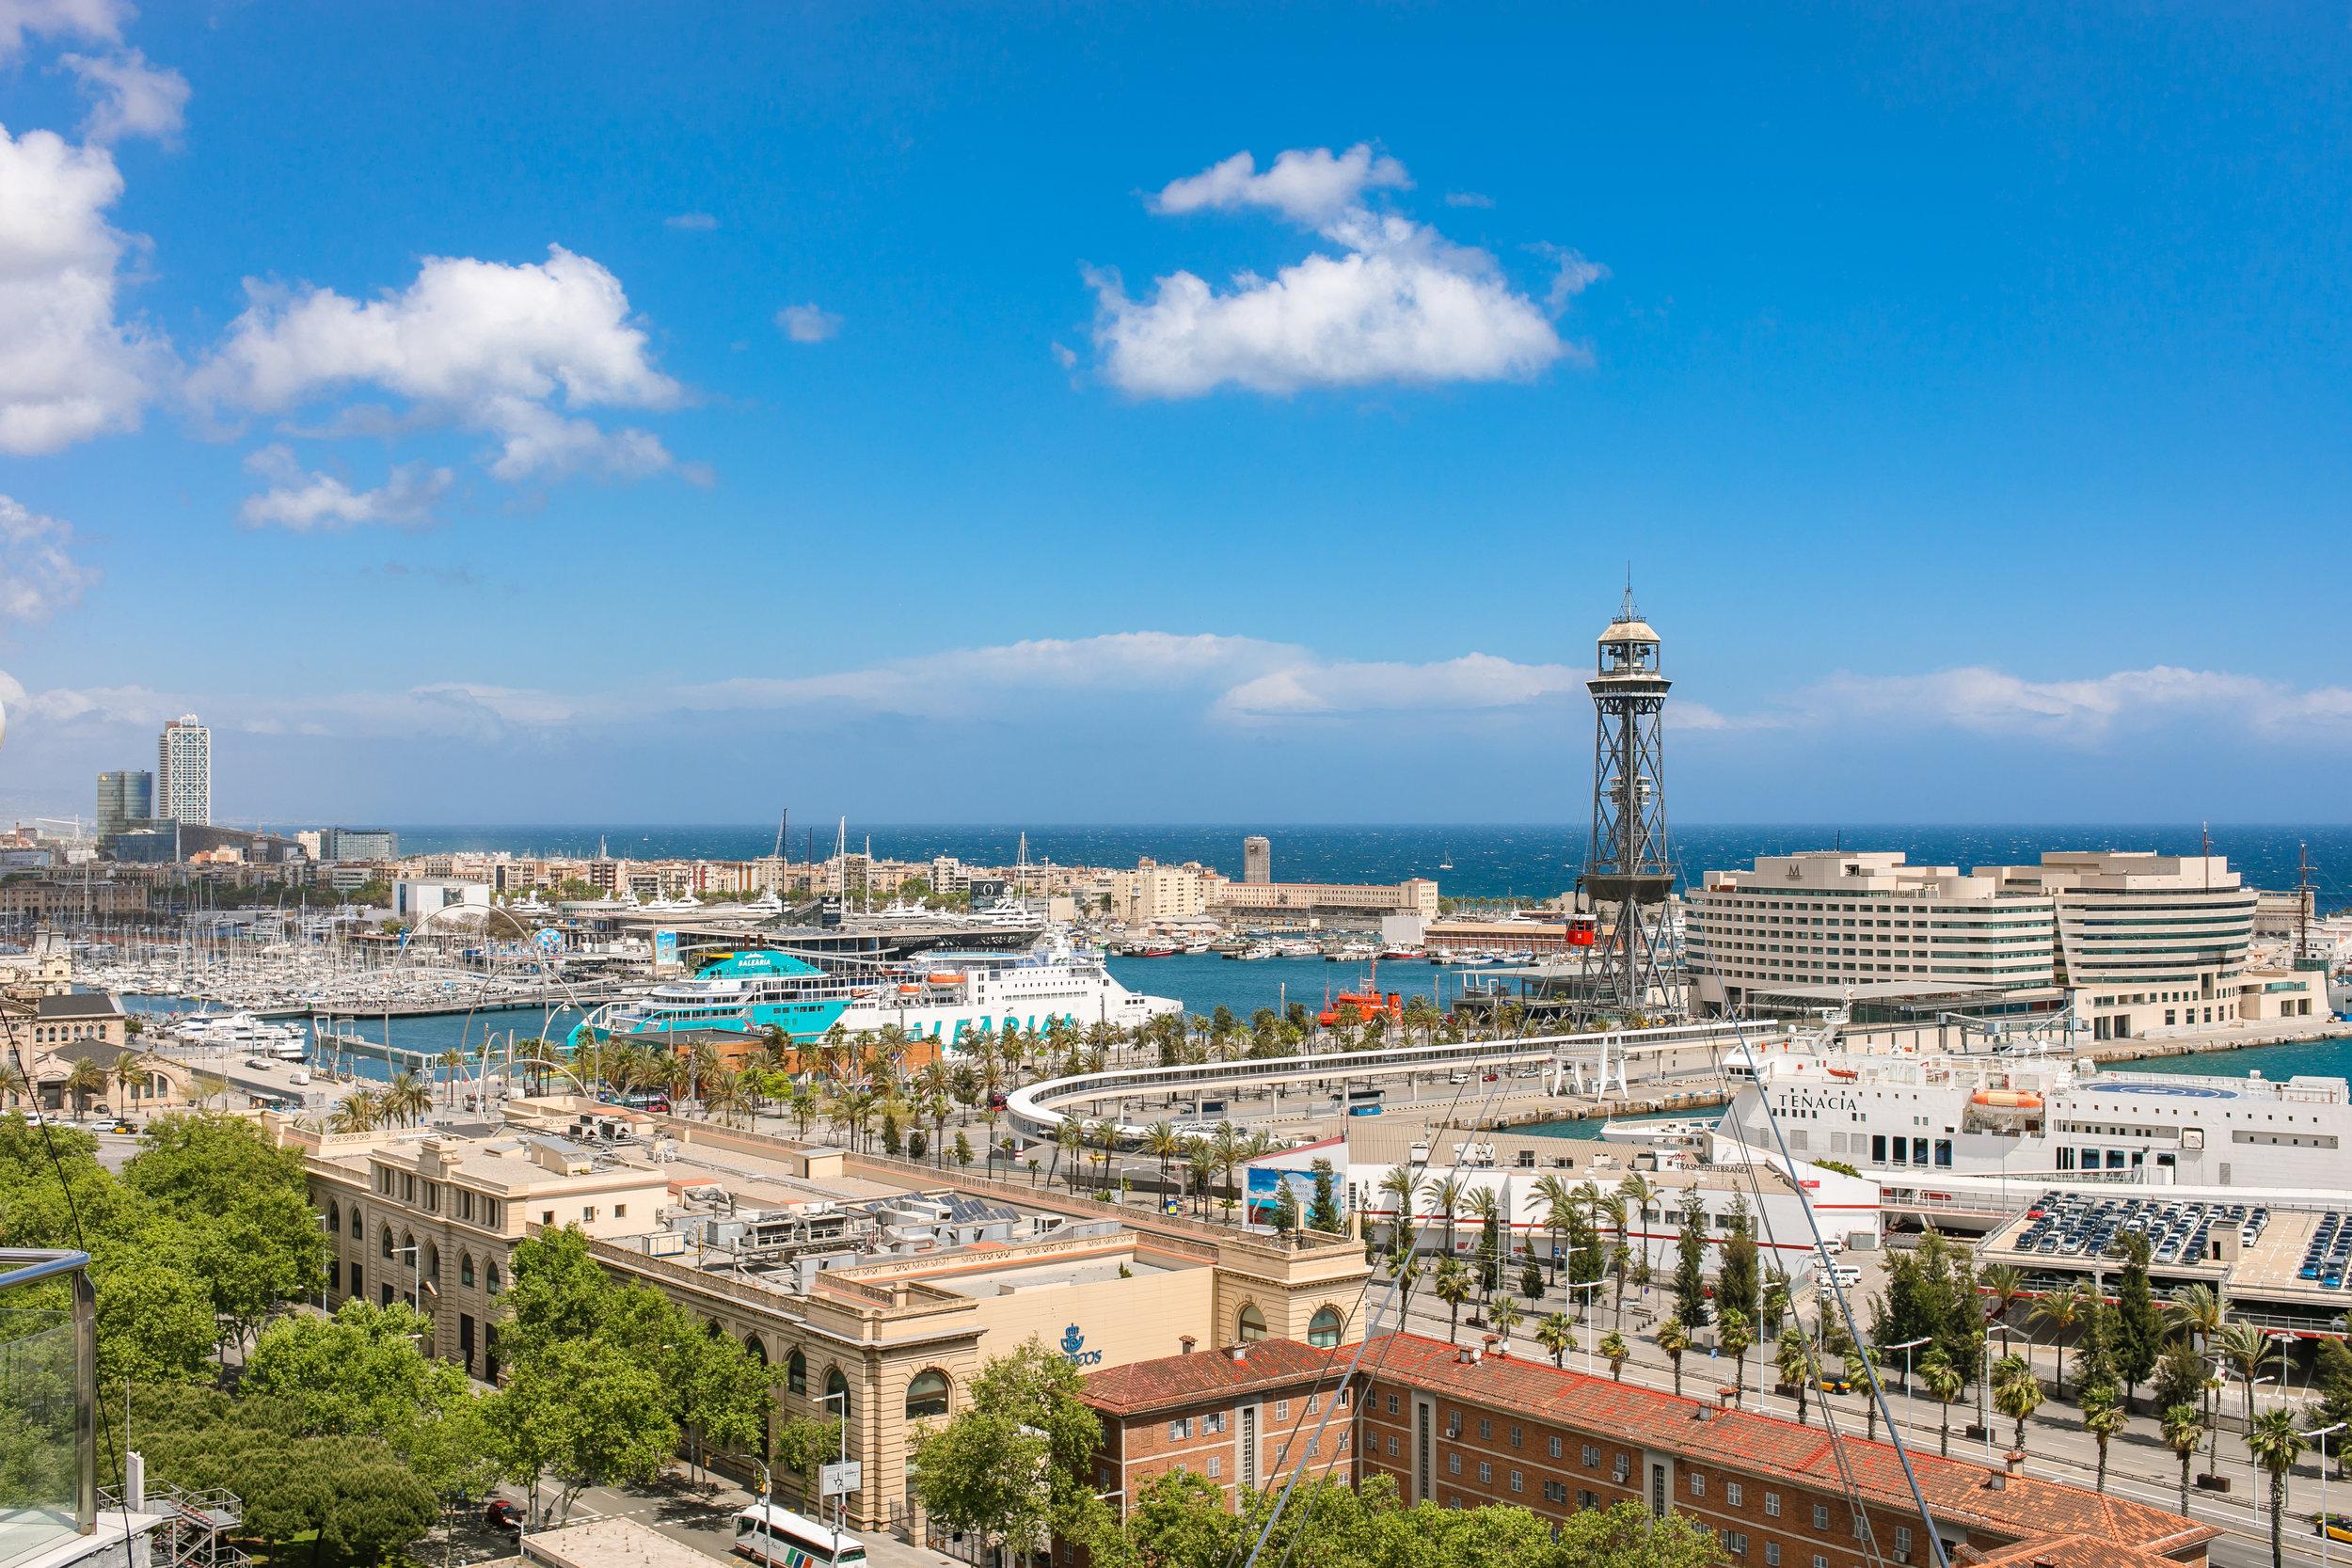 Barcelona's cruise terminal area.